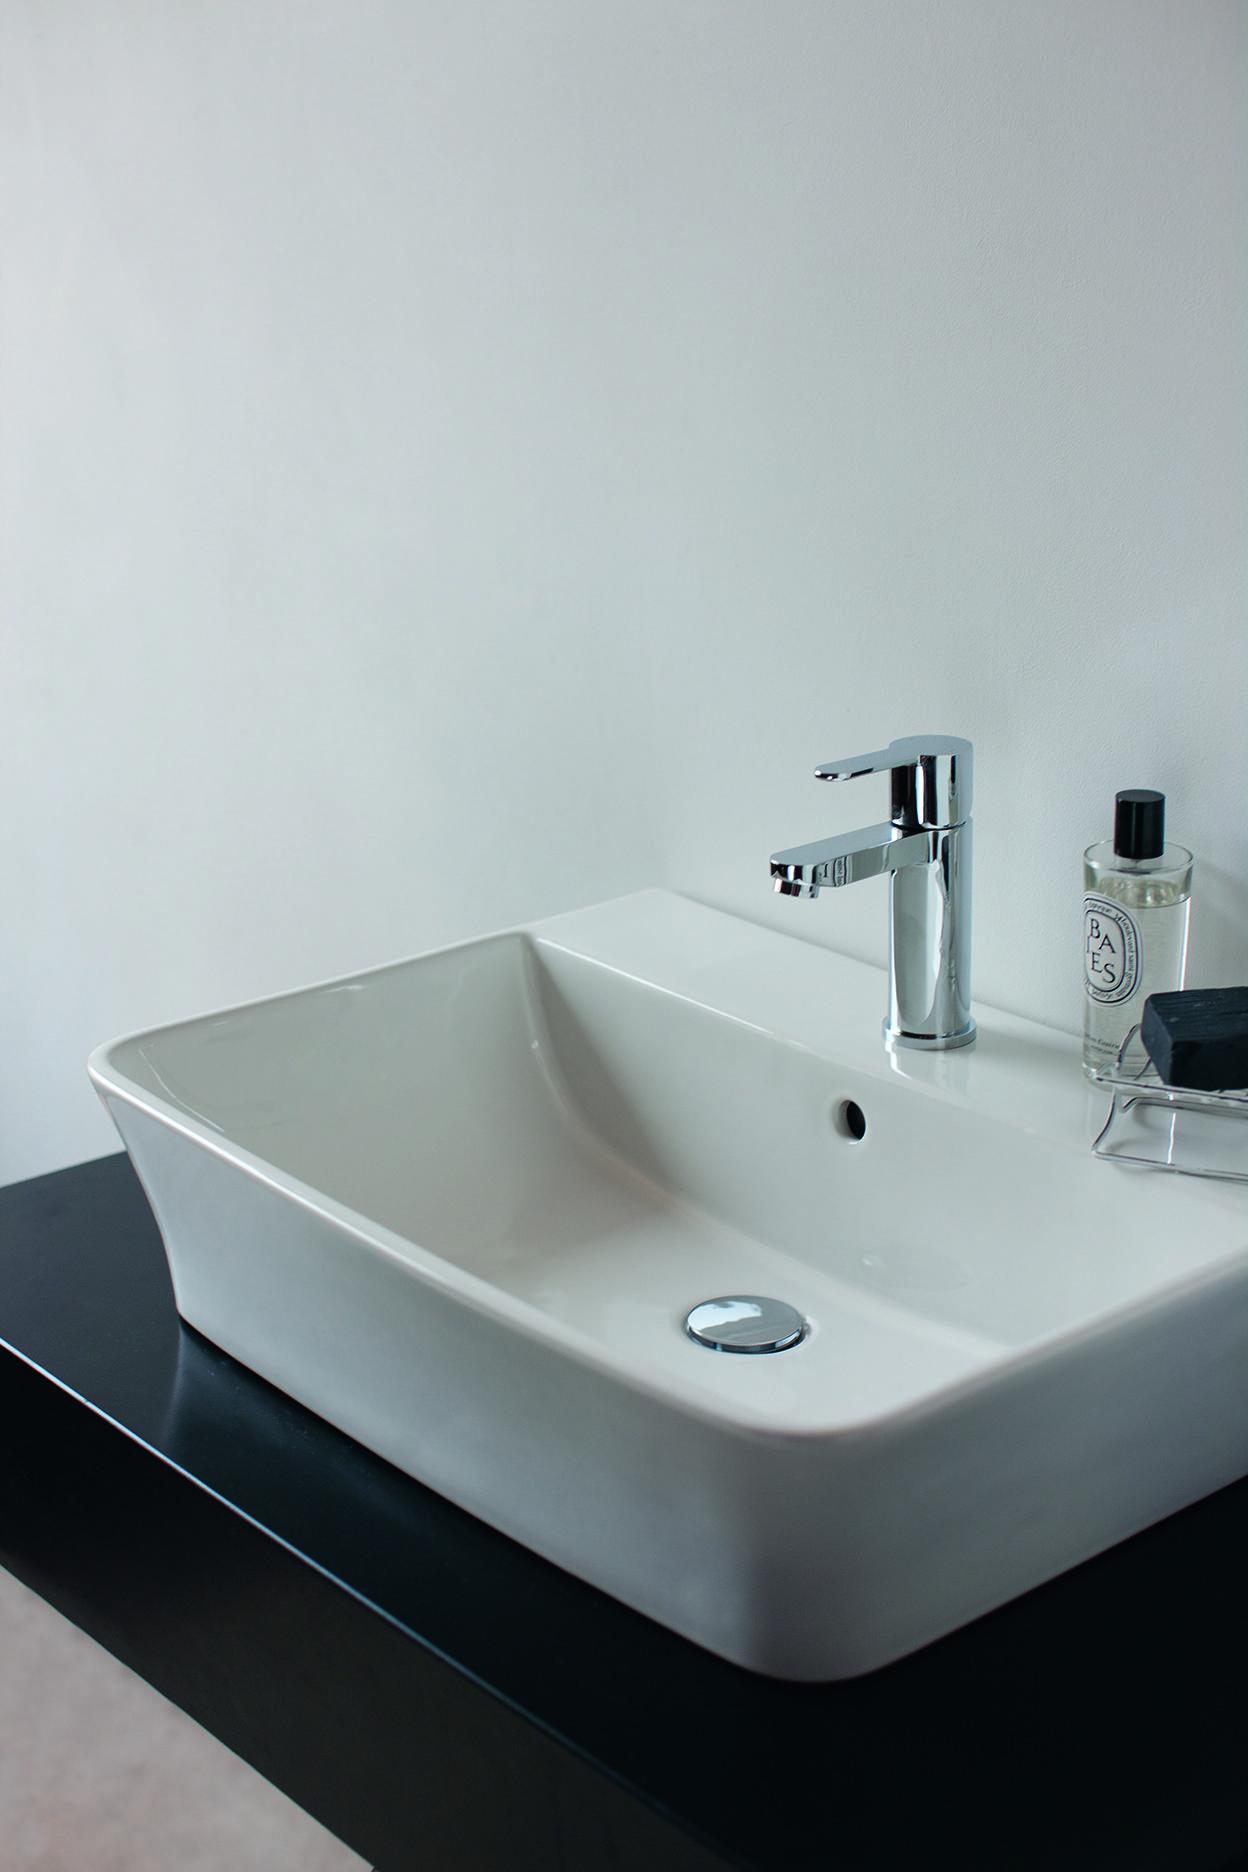 Pin by Britton Bathrooms on Taps   Pinterest   International brands ...